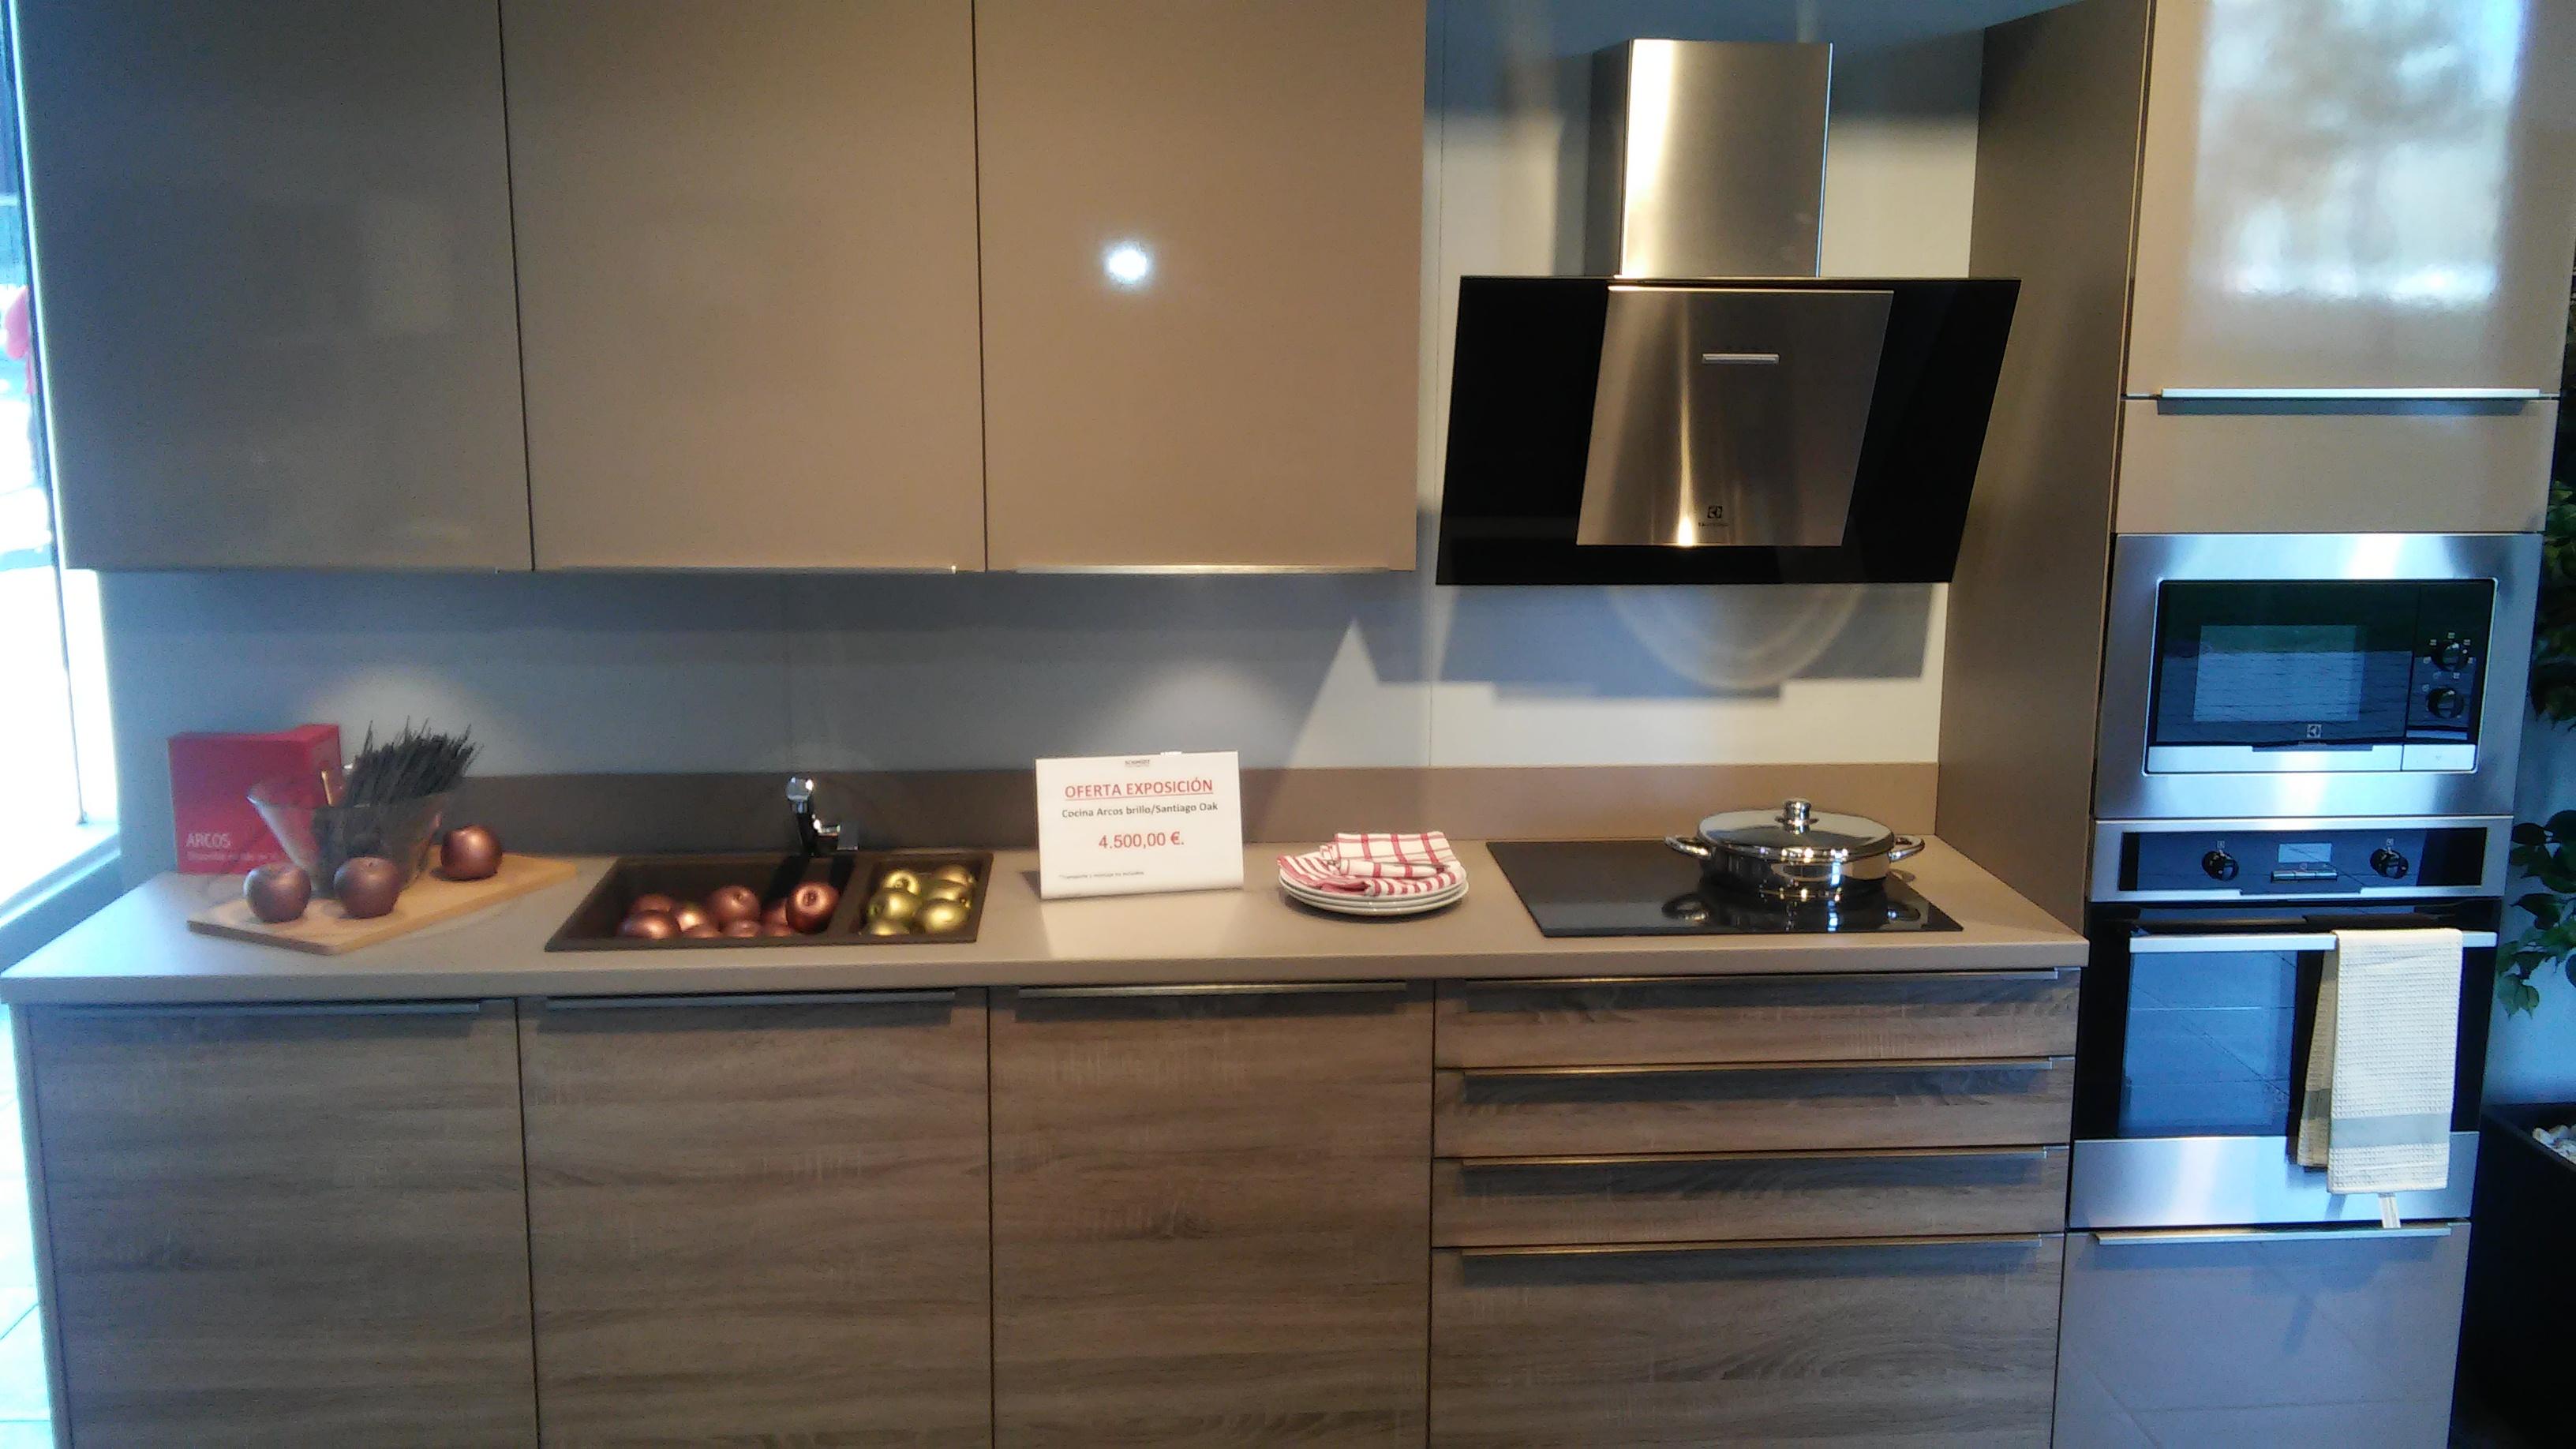 Su tienda schmidt l 39 hospitalet de llobregat barcelona for Muebles de cocina wilde